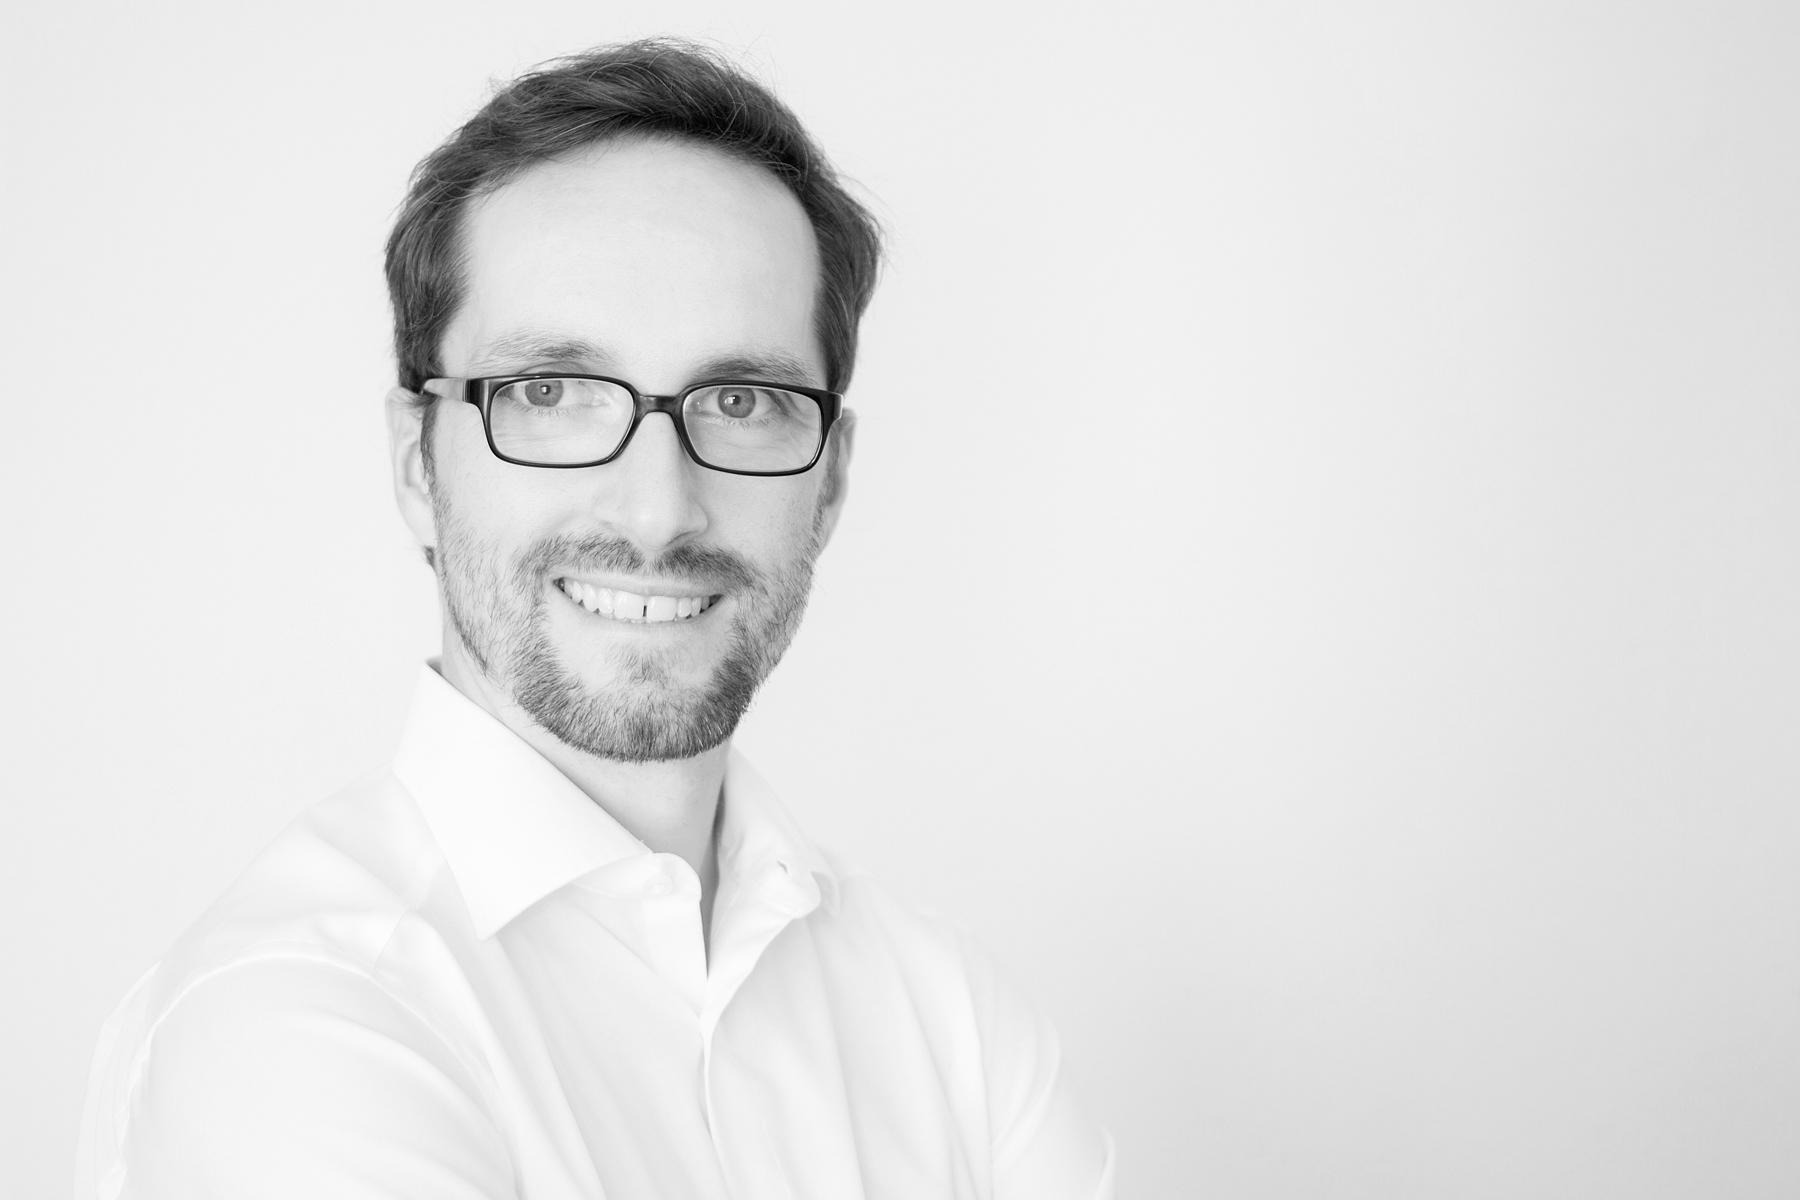 Webservice Frank Seltmann - über mich